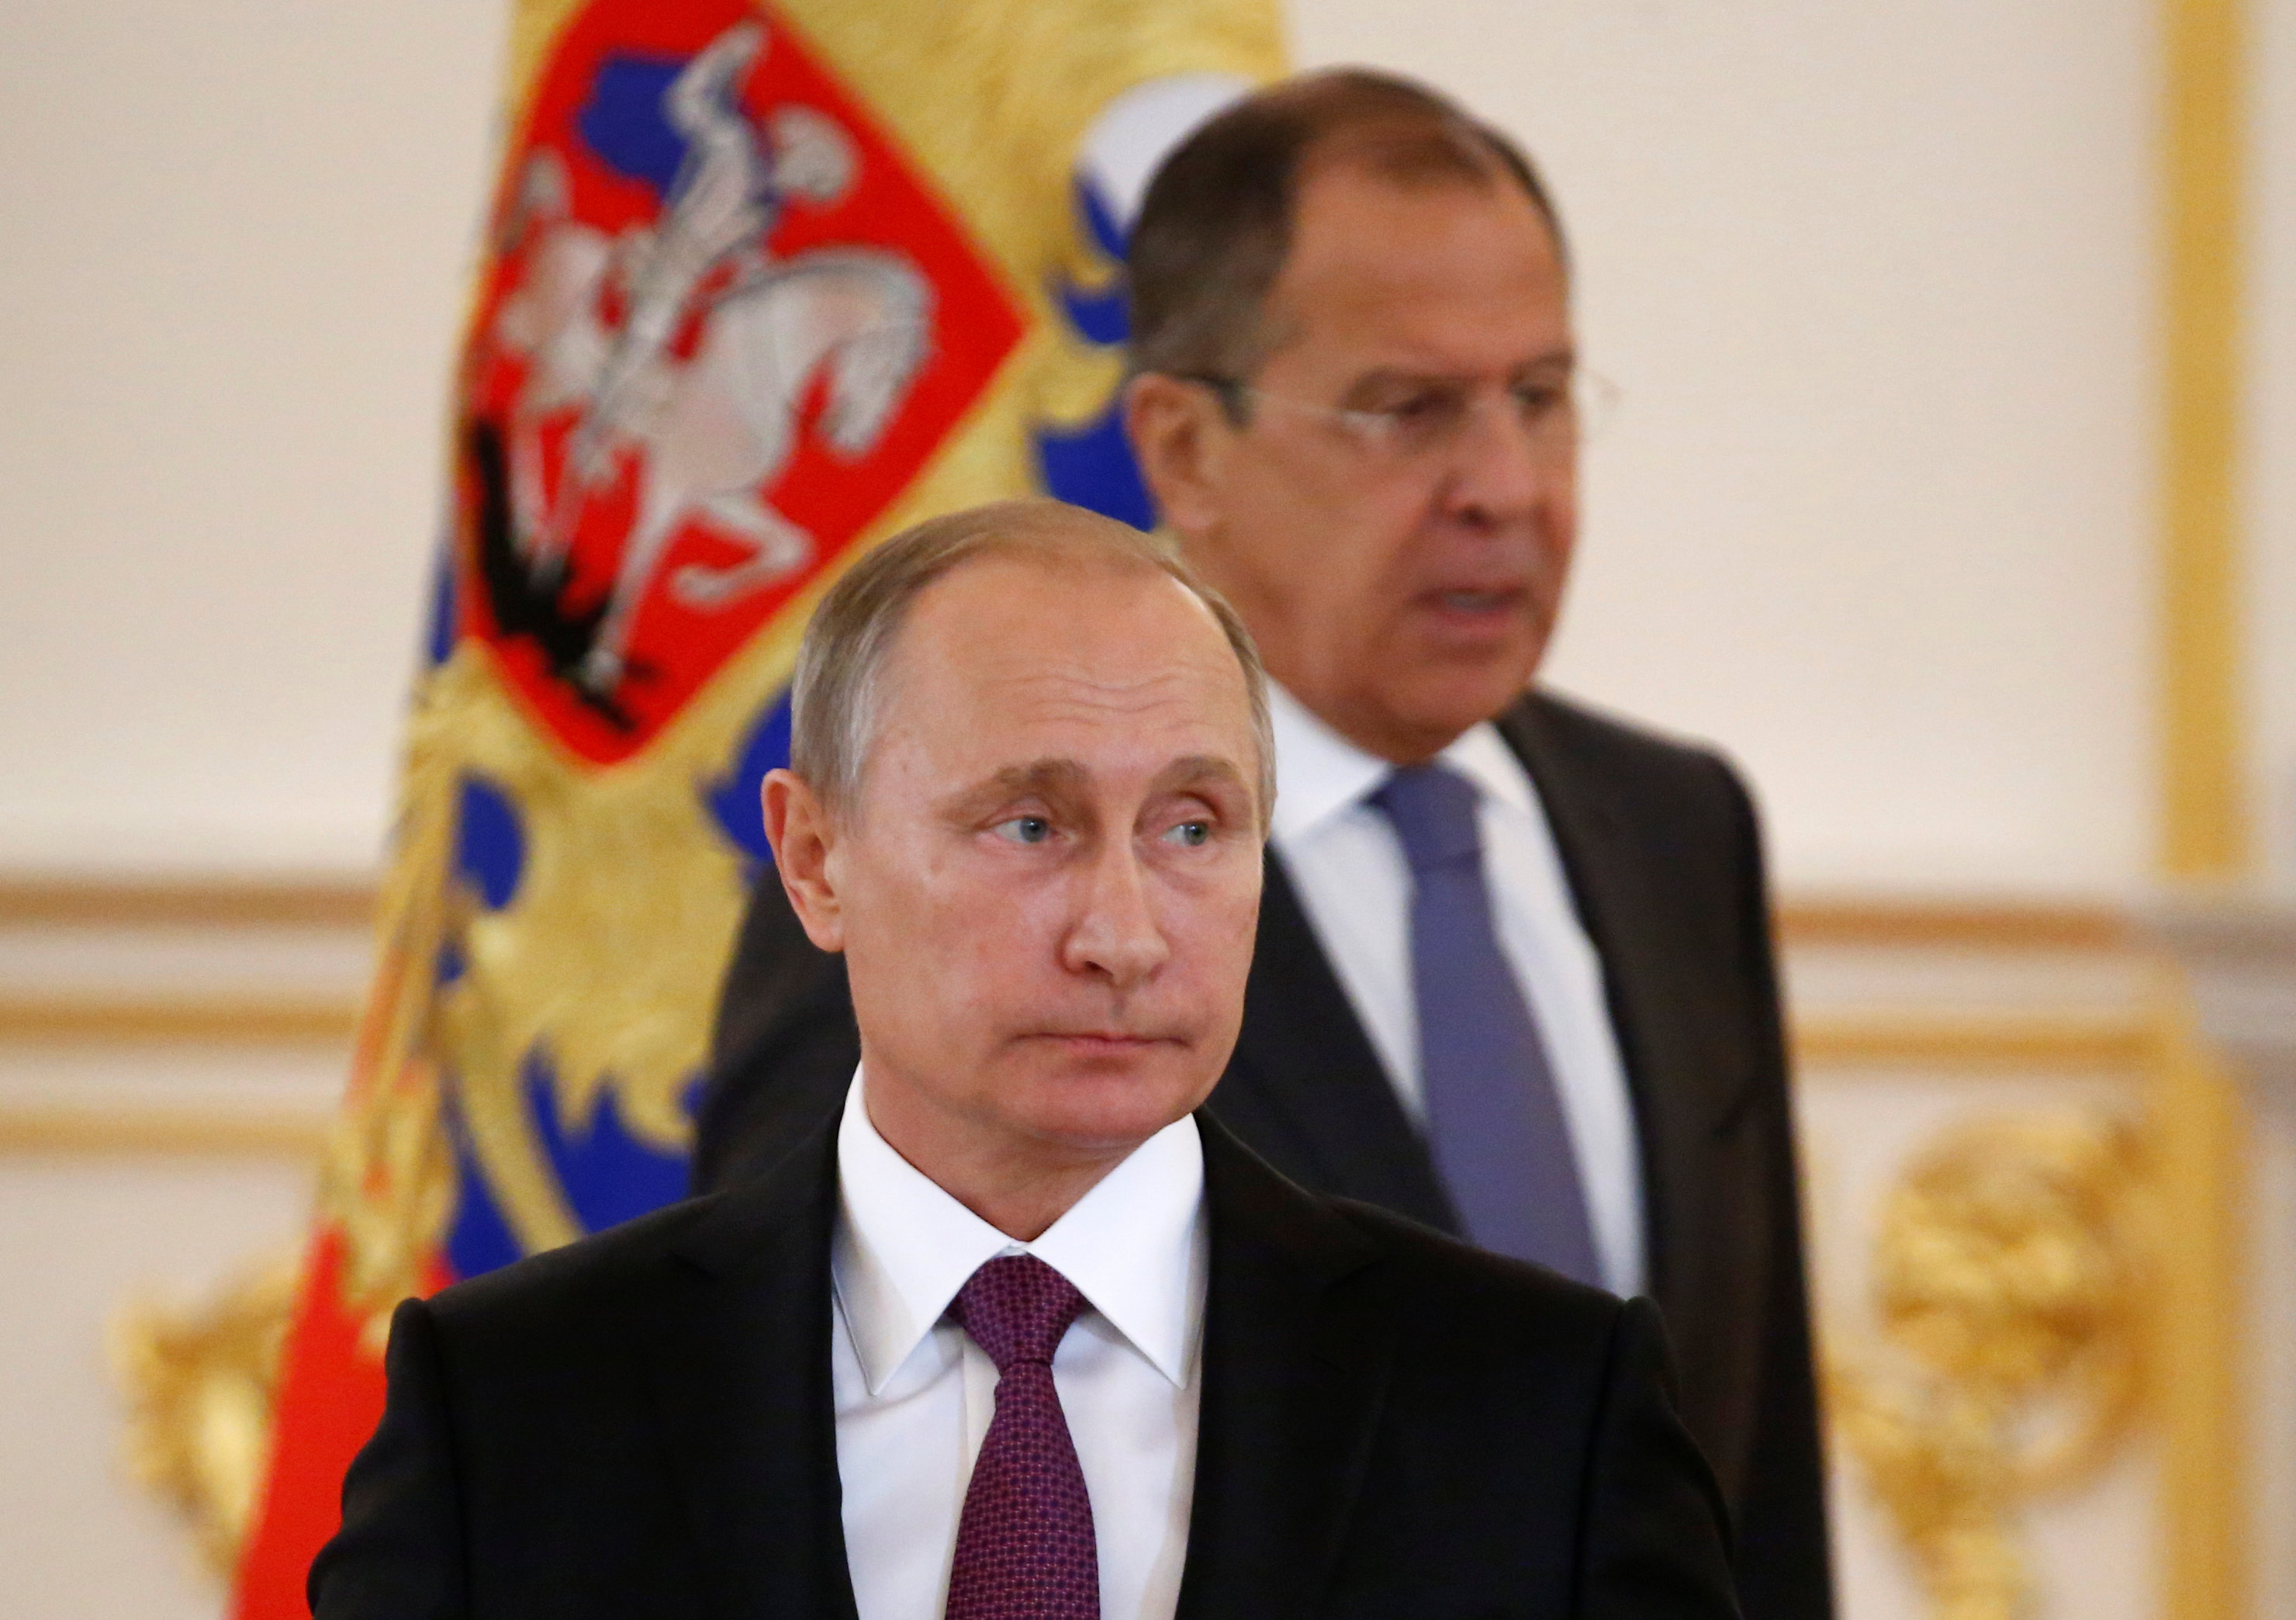 Putin congratulates Trump on victory, seeks better ties